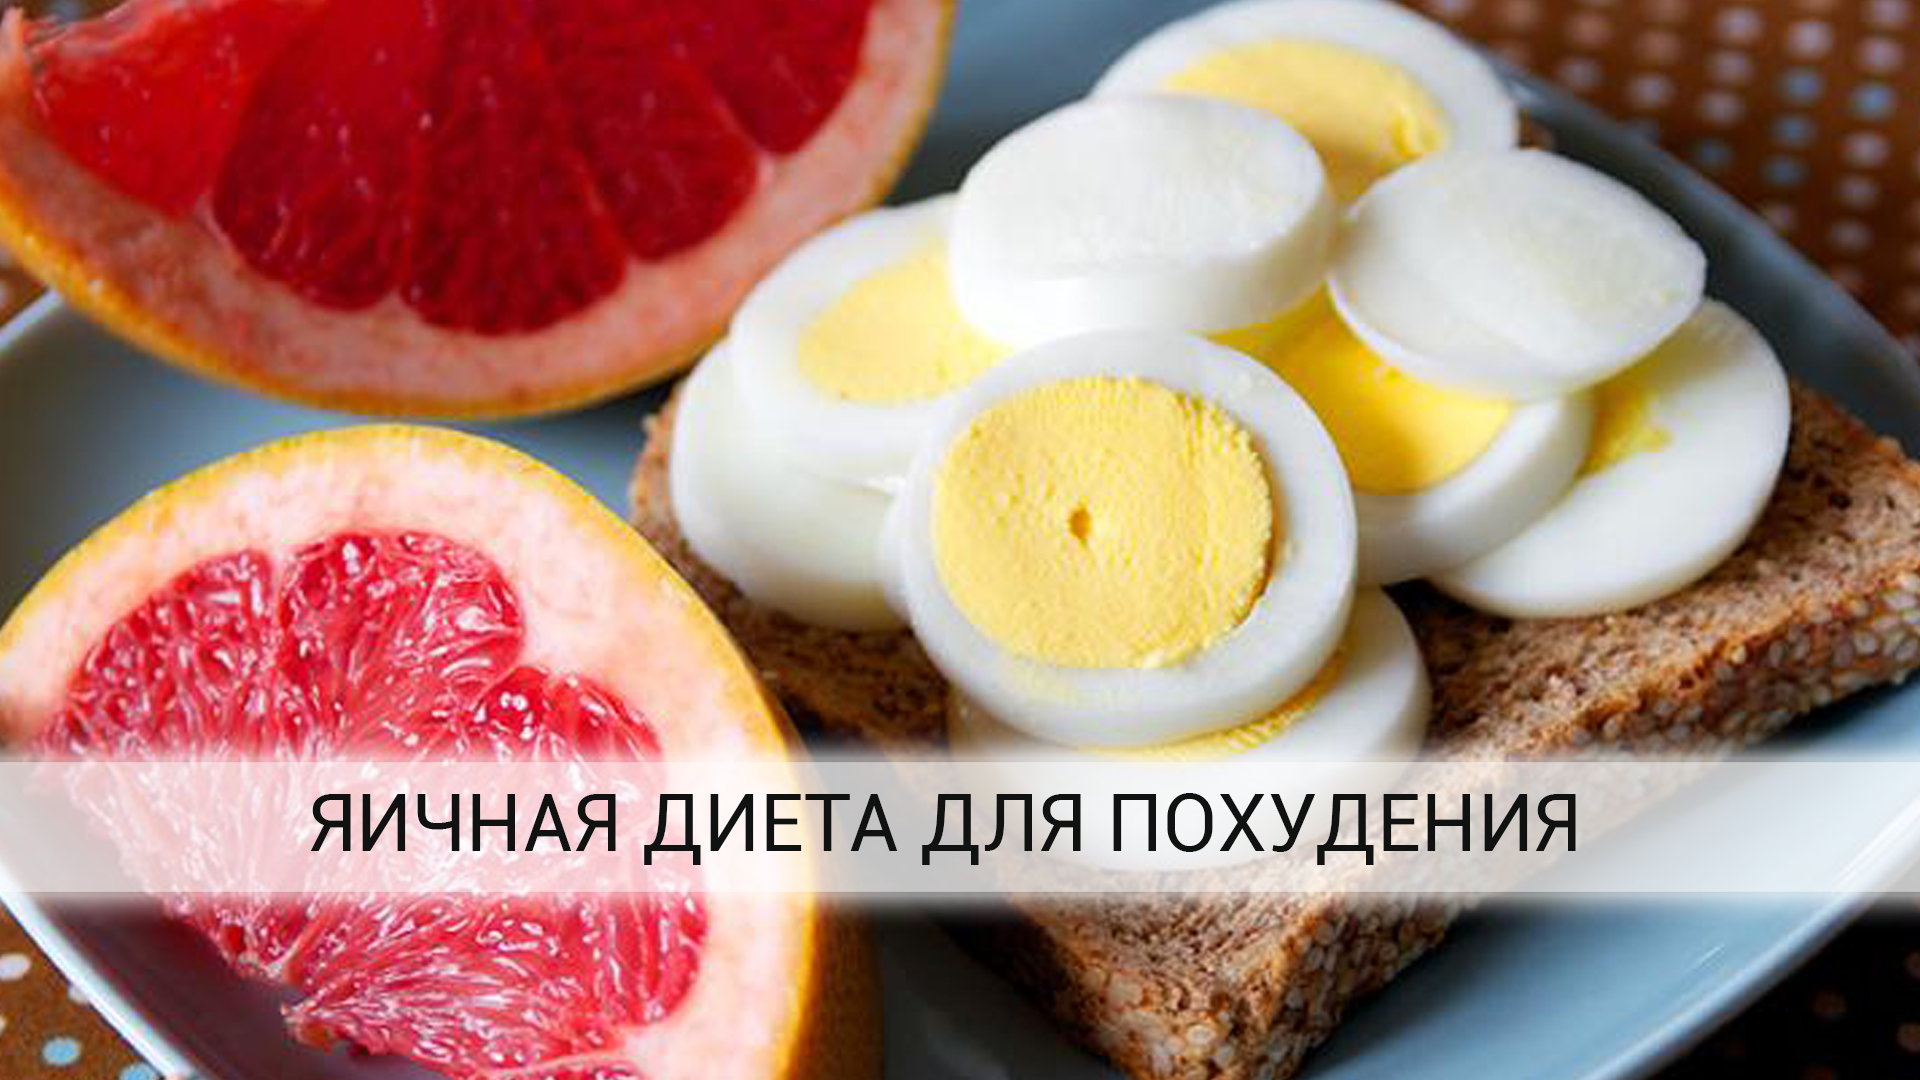 Яичная Диета Минус. Яичная диета на 4 недели: под знаком белка и желтка